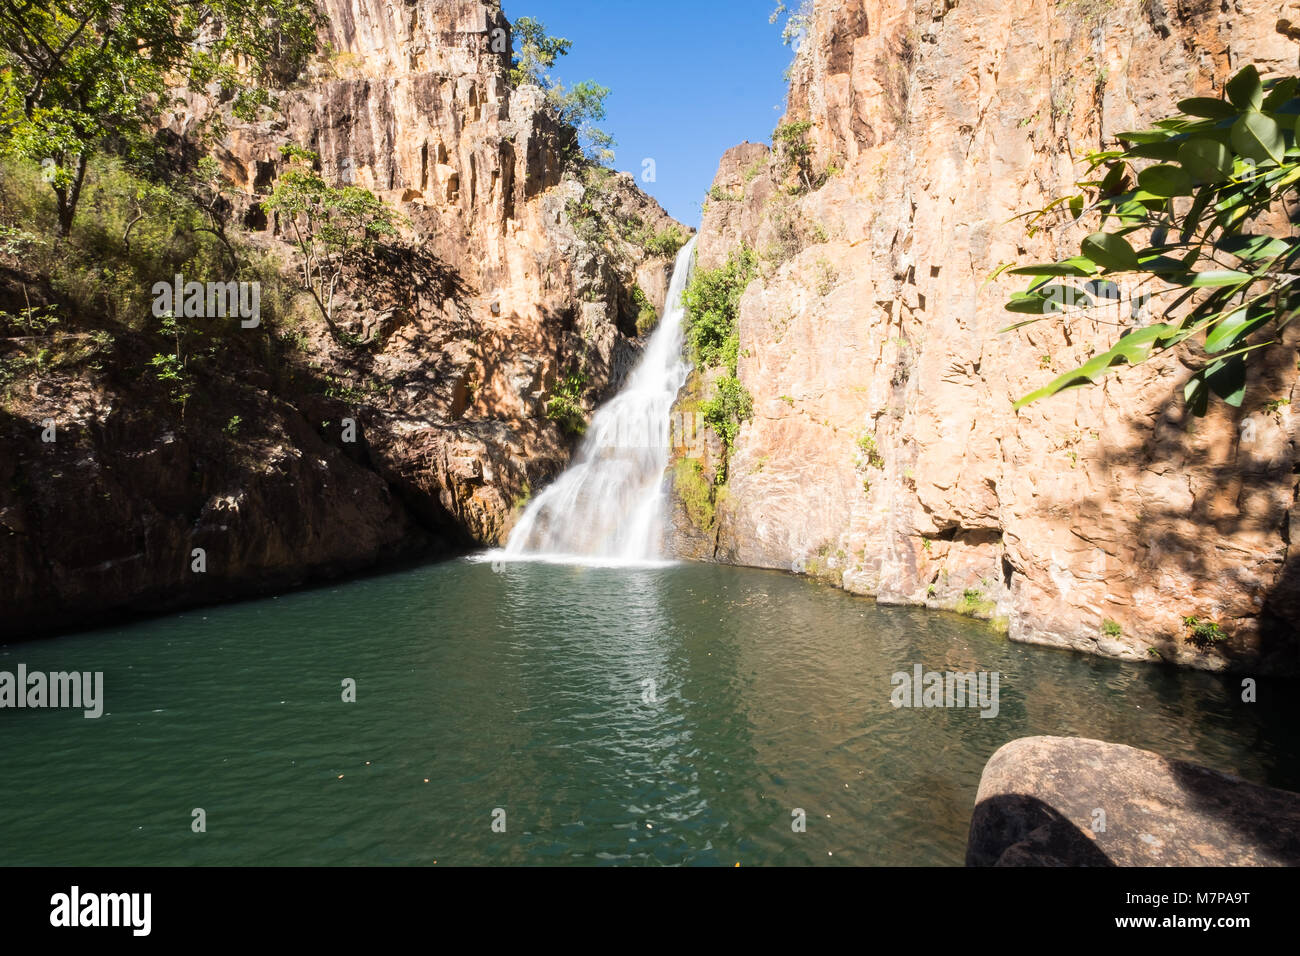 Beautiful Cachoeira dos Macaquinhos in Chapada dos Veadeiros, Goias, Brazil - Stock Image